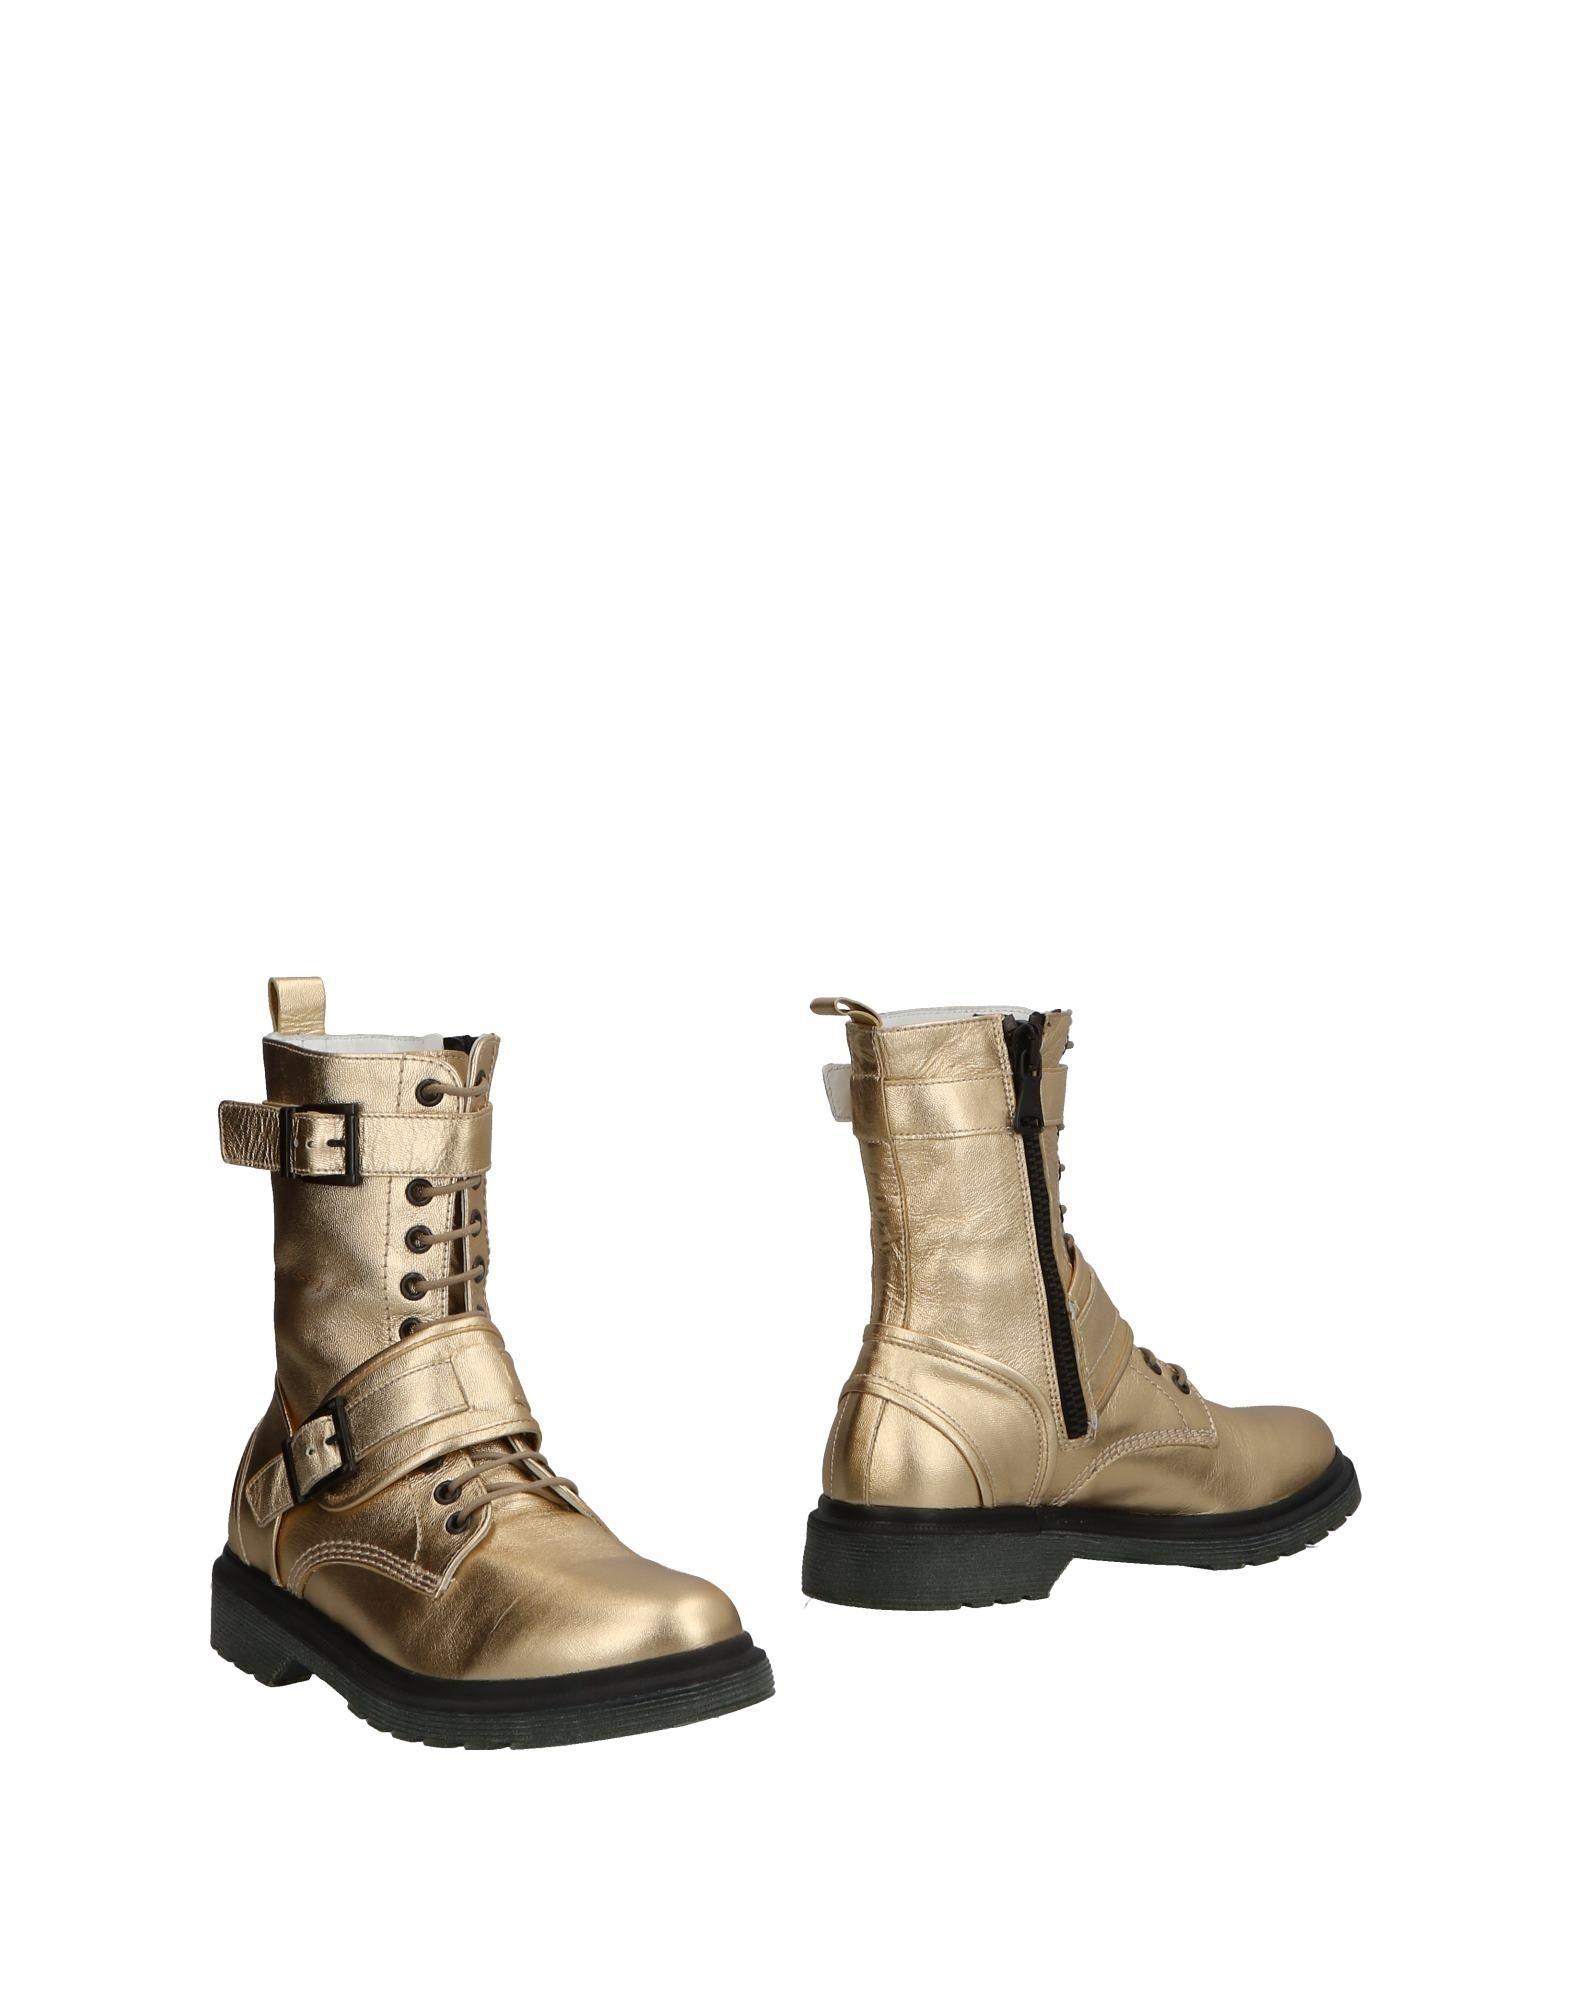 Stilvolle Stiefelette billige Schuhe Le Qarant Stiefelette Stilvolle Damen  44808672FV 53f011